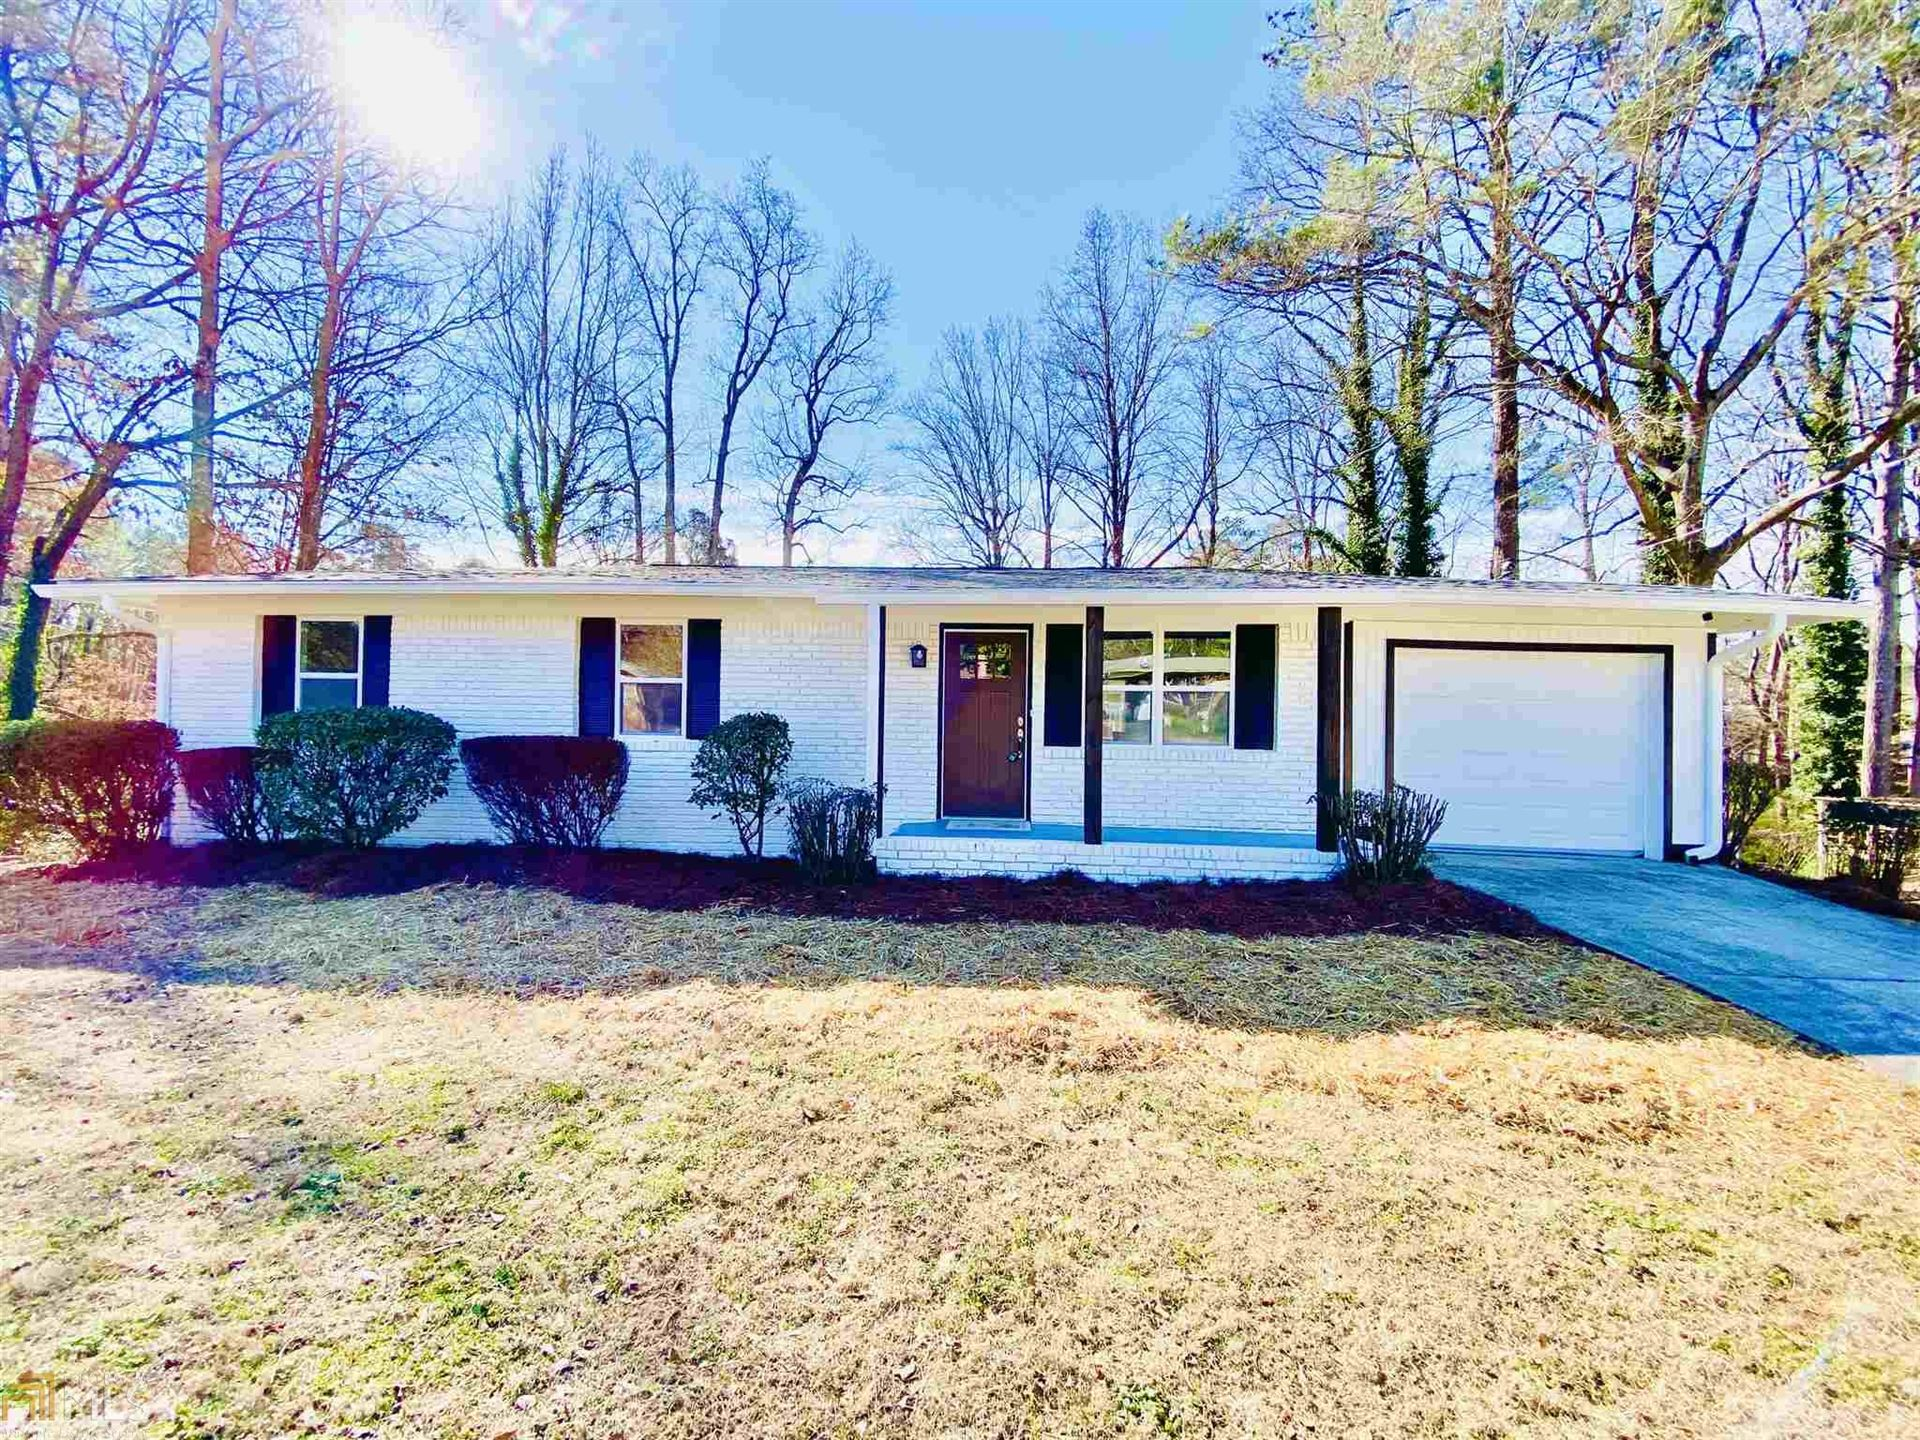 444 Concord Woods, Smyrna, GA 30082 - MLS#: 8915812